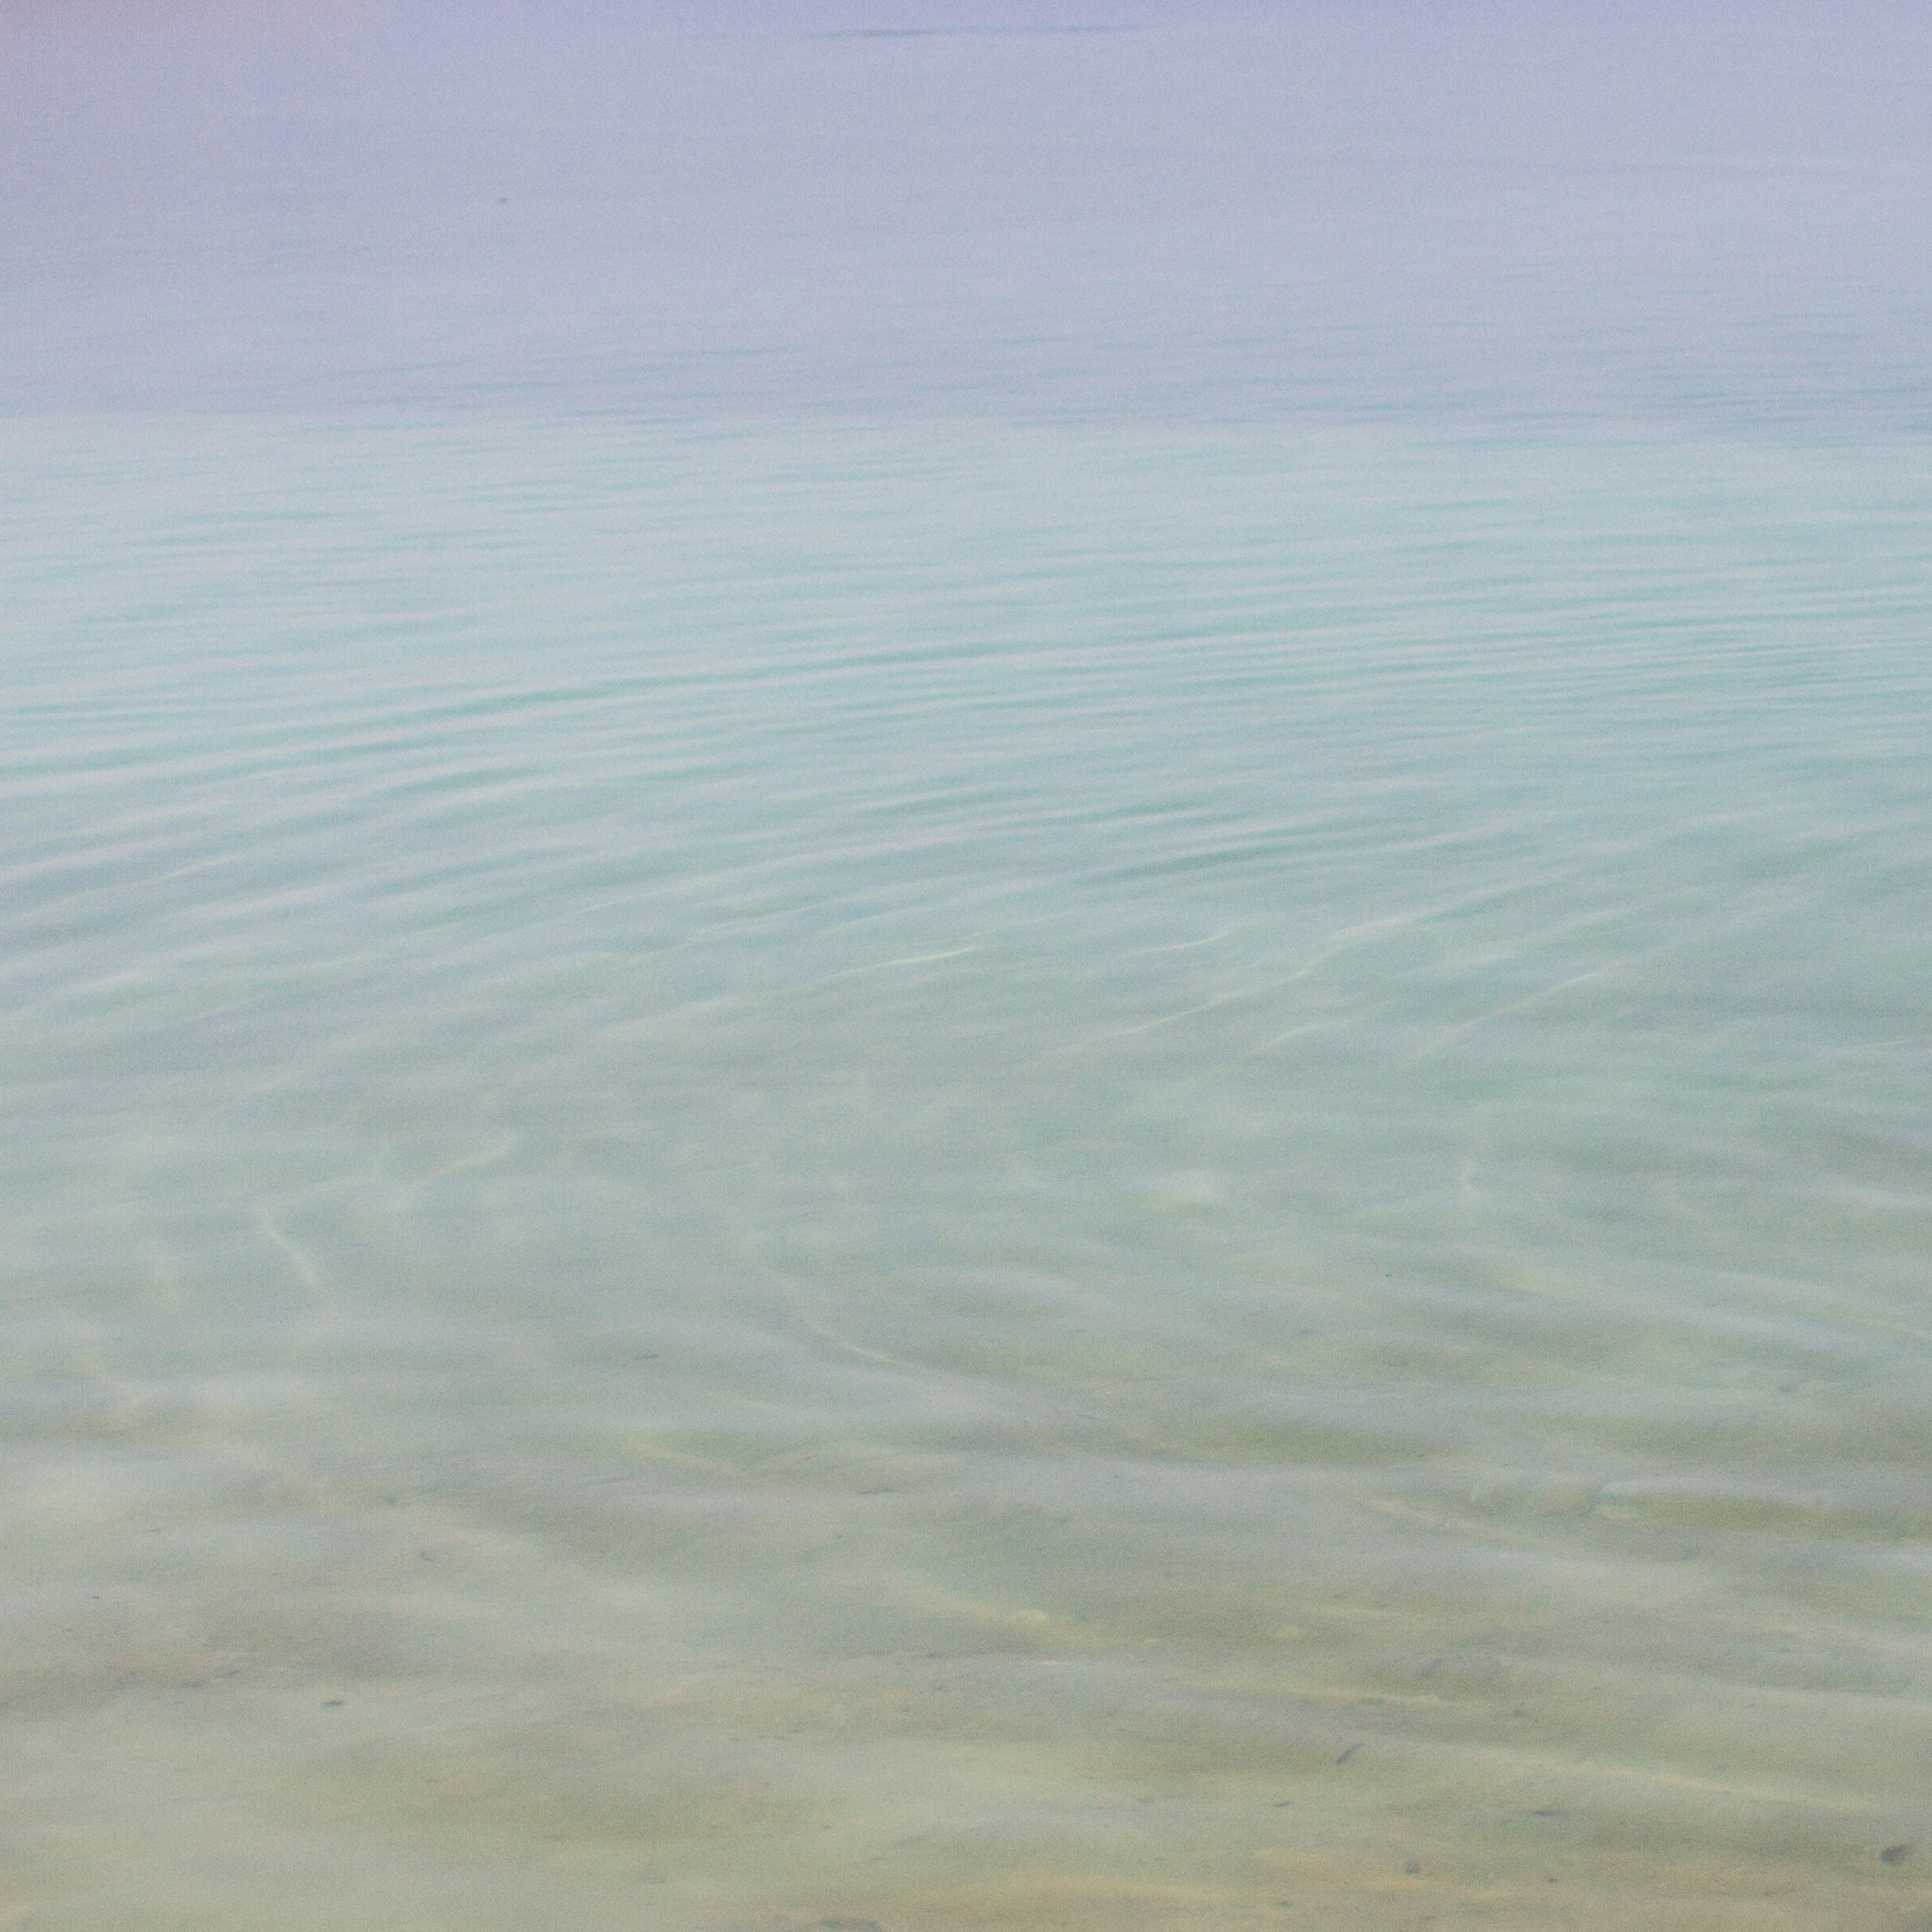 Seascape-1.jpg